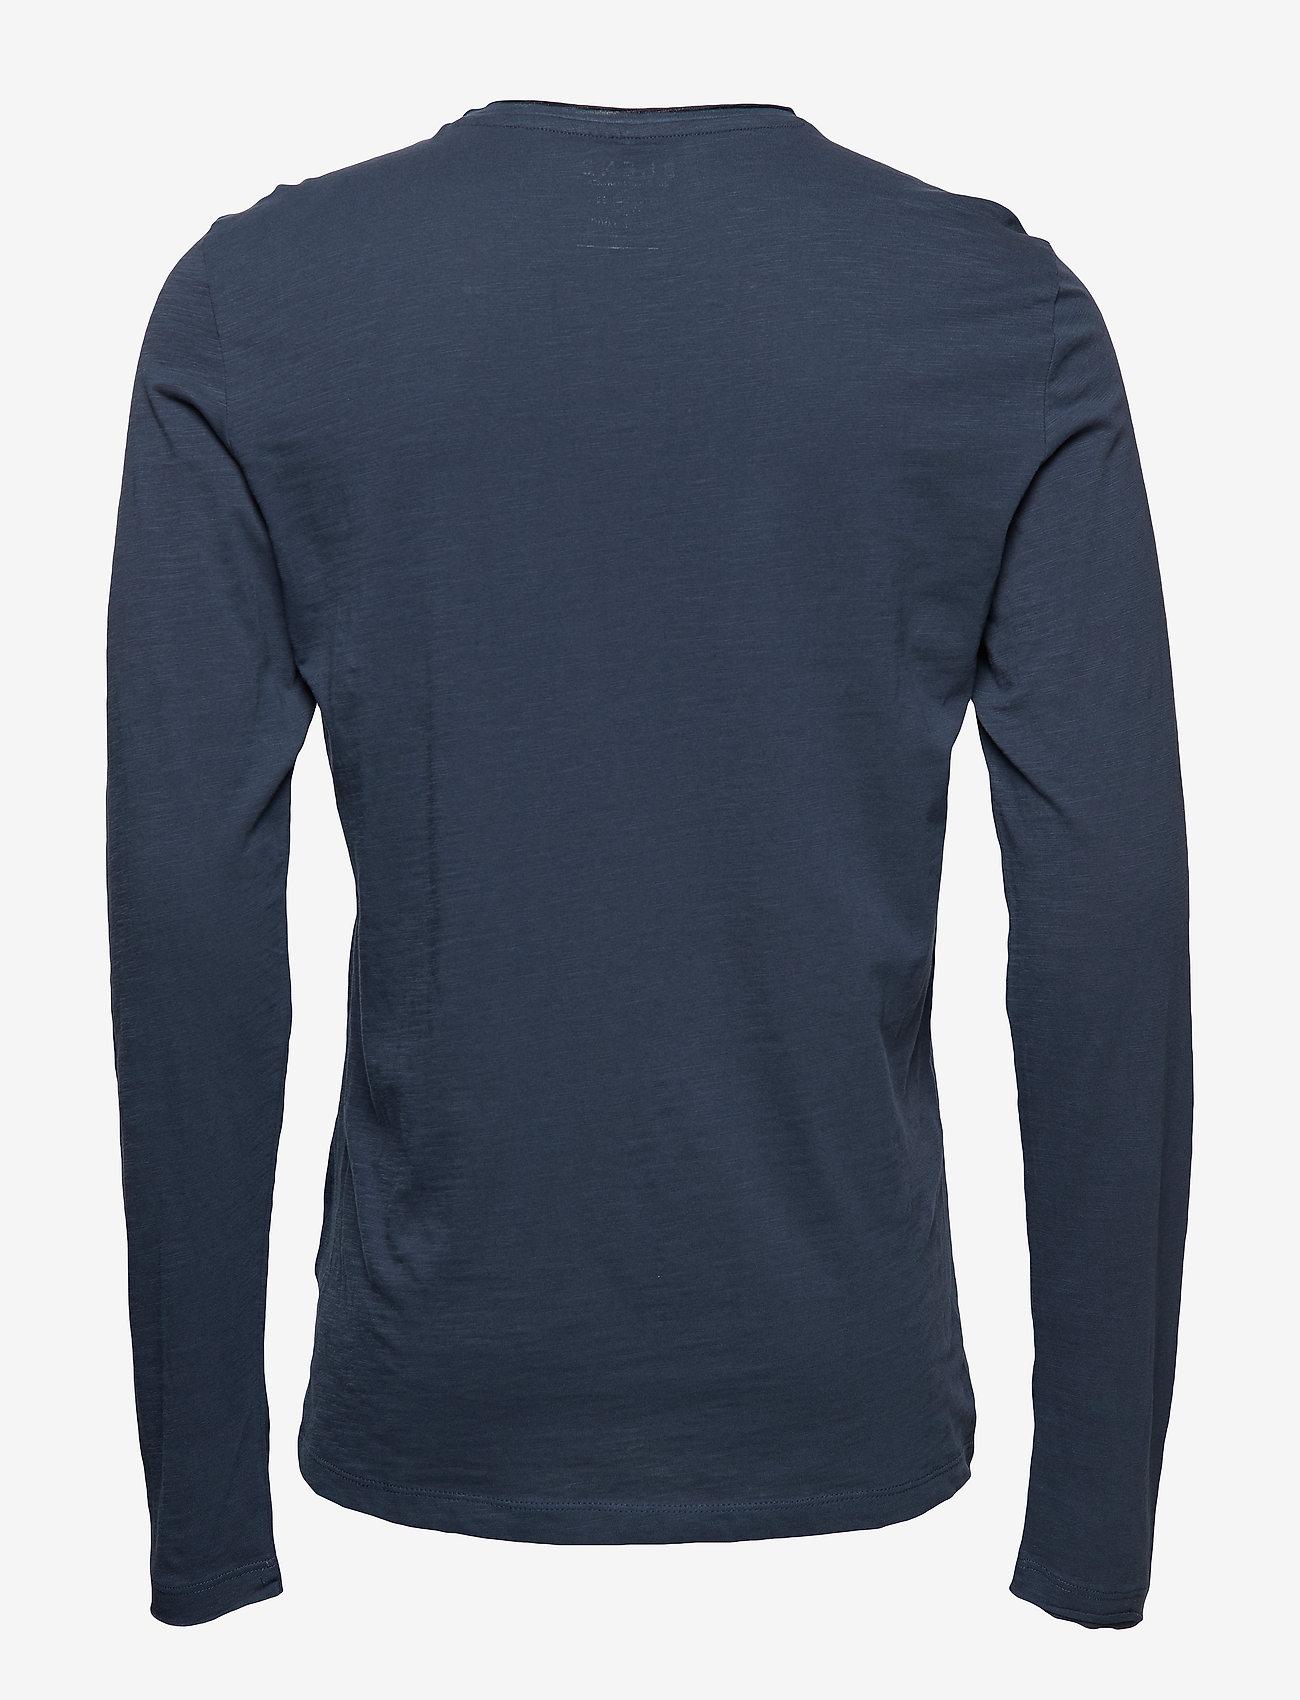 Blend - BHNICOLAI tee l.s. NOOS - basic t-shirts - midnight blue - 1